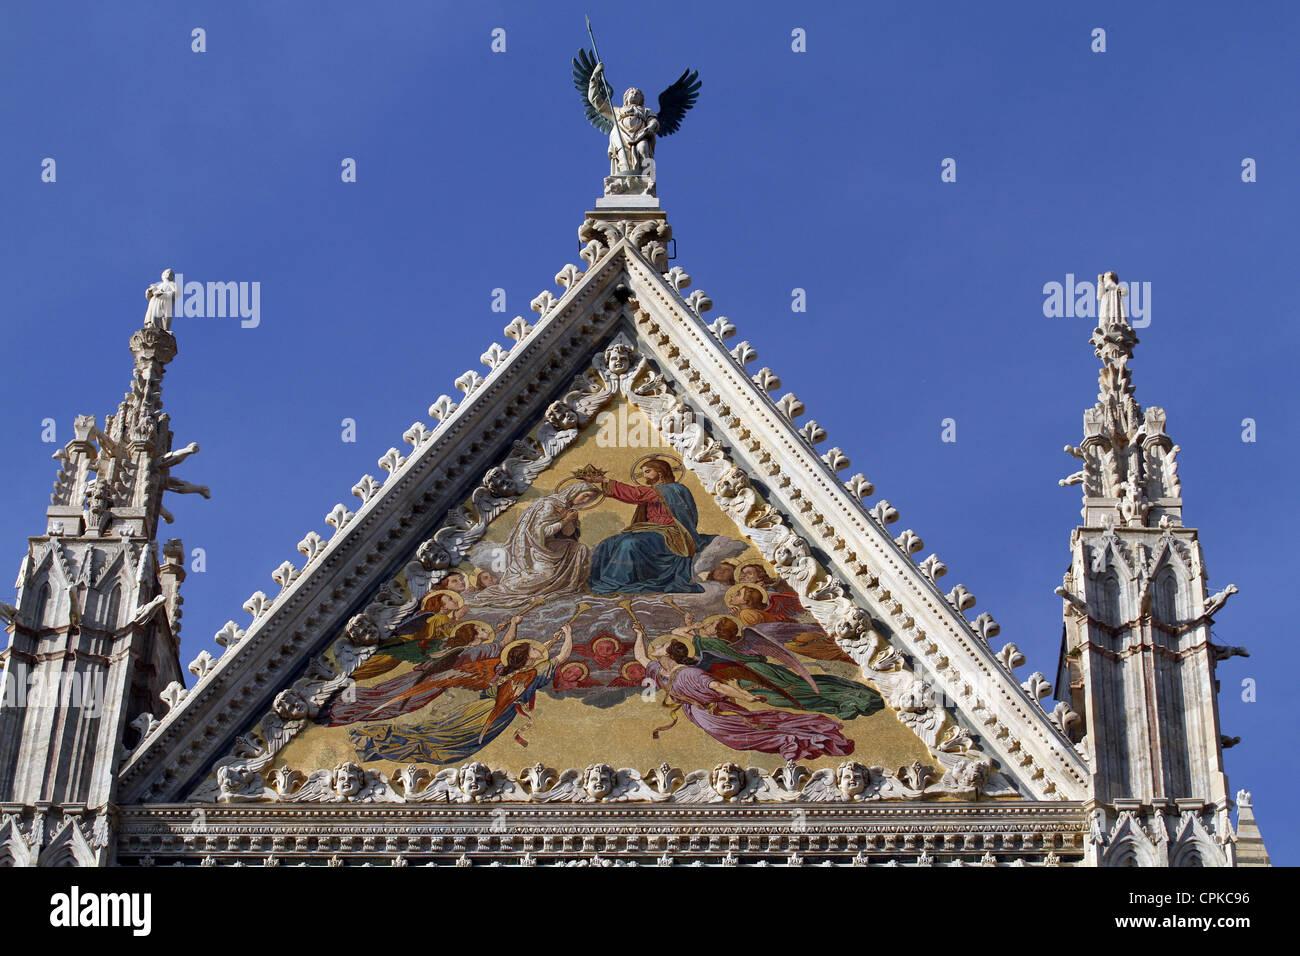 DIE Kathedrale von SIENA MAIN Fassade SIENA Toskana Italien 10. Mai 2012 Stockbild